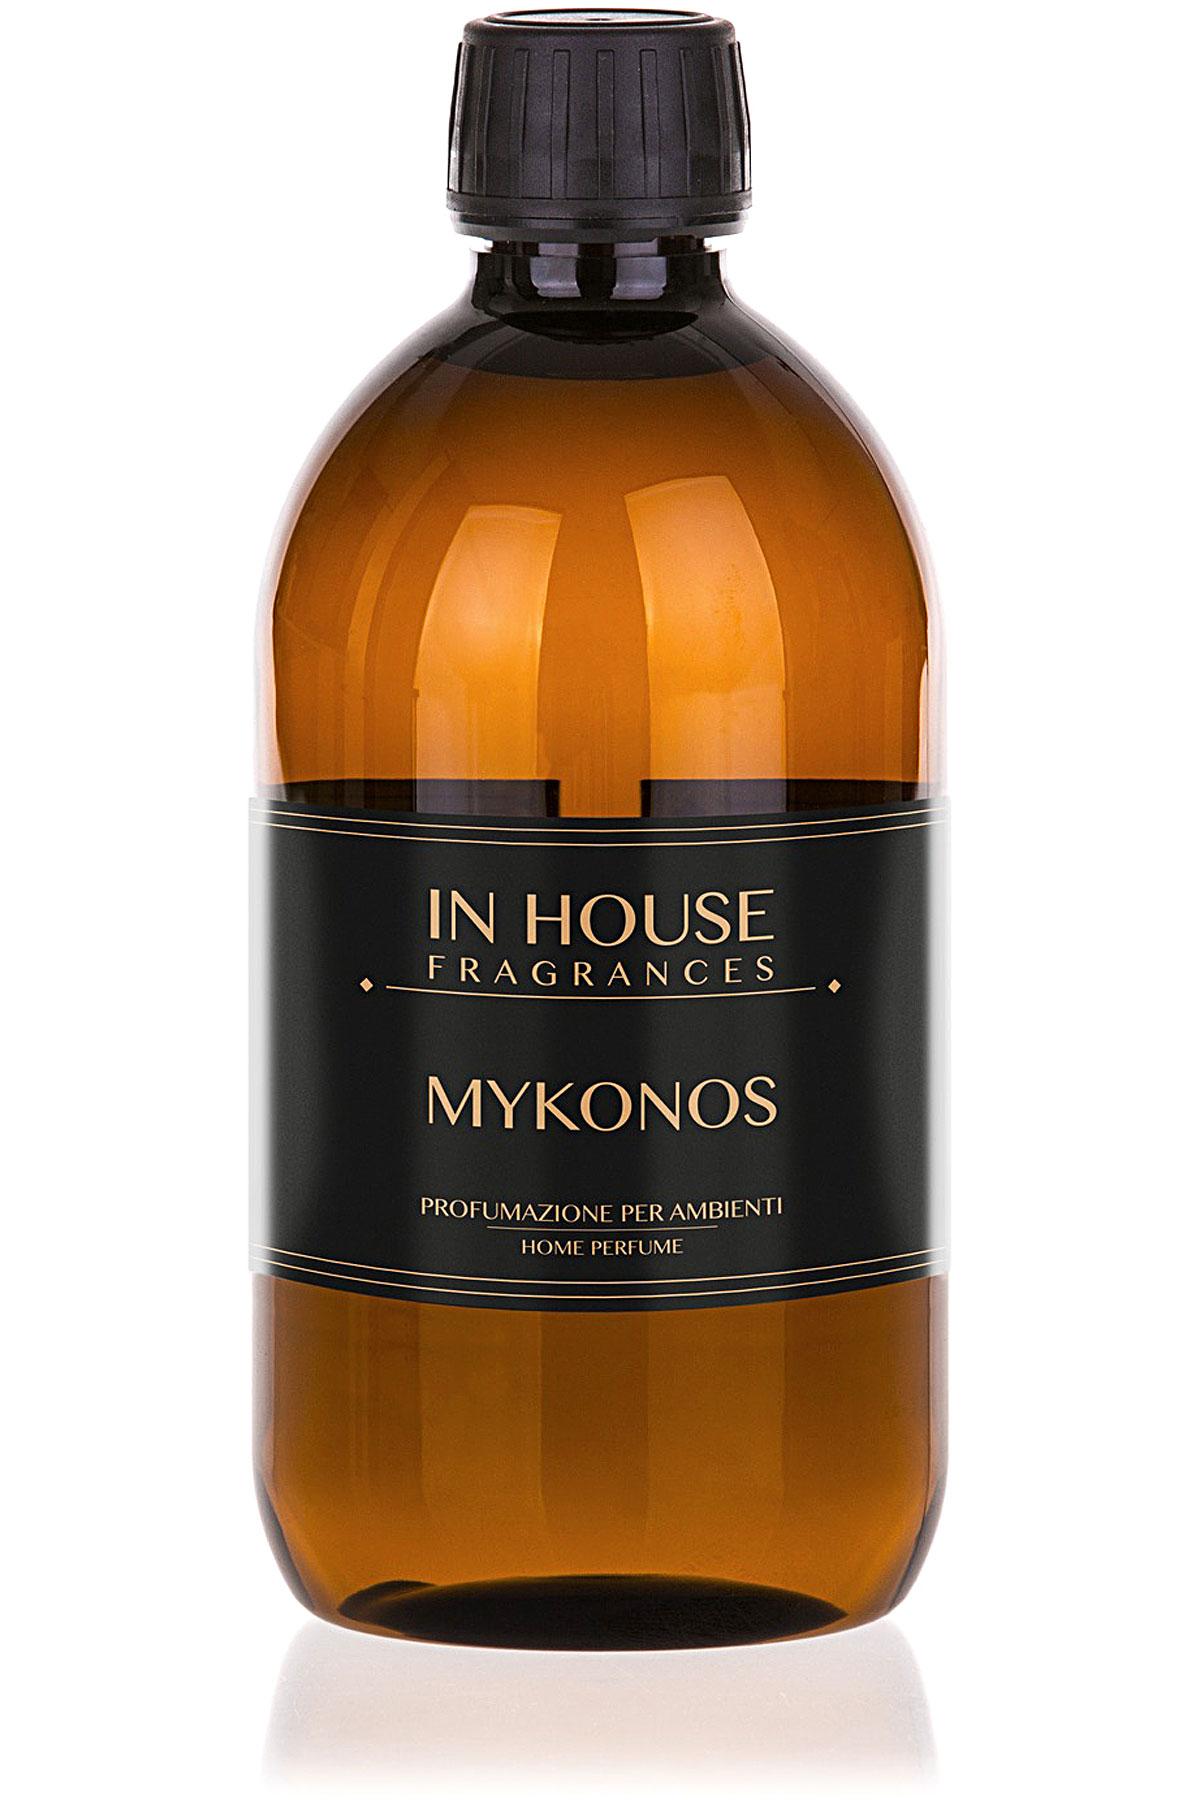 In House Fragrances Home Scents for Men, Mykonos - Refill - 500 Ml, 2019, 500 ml